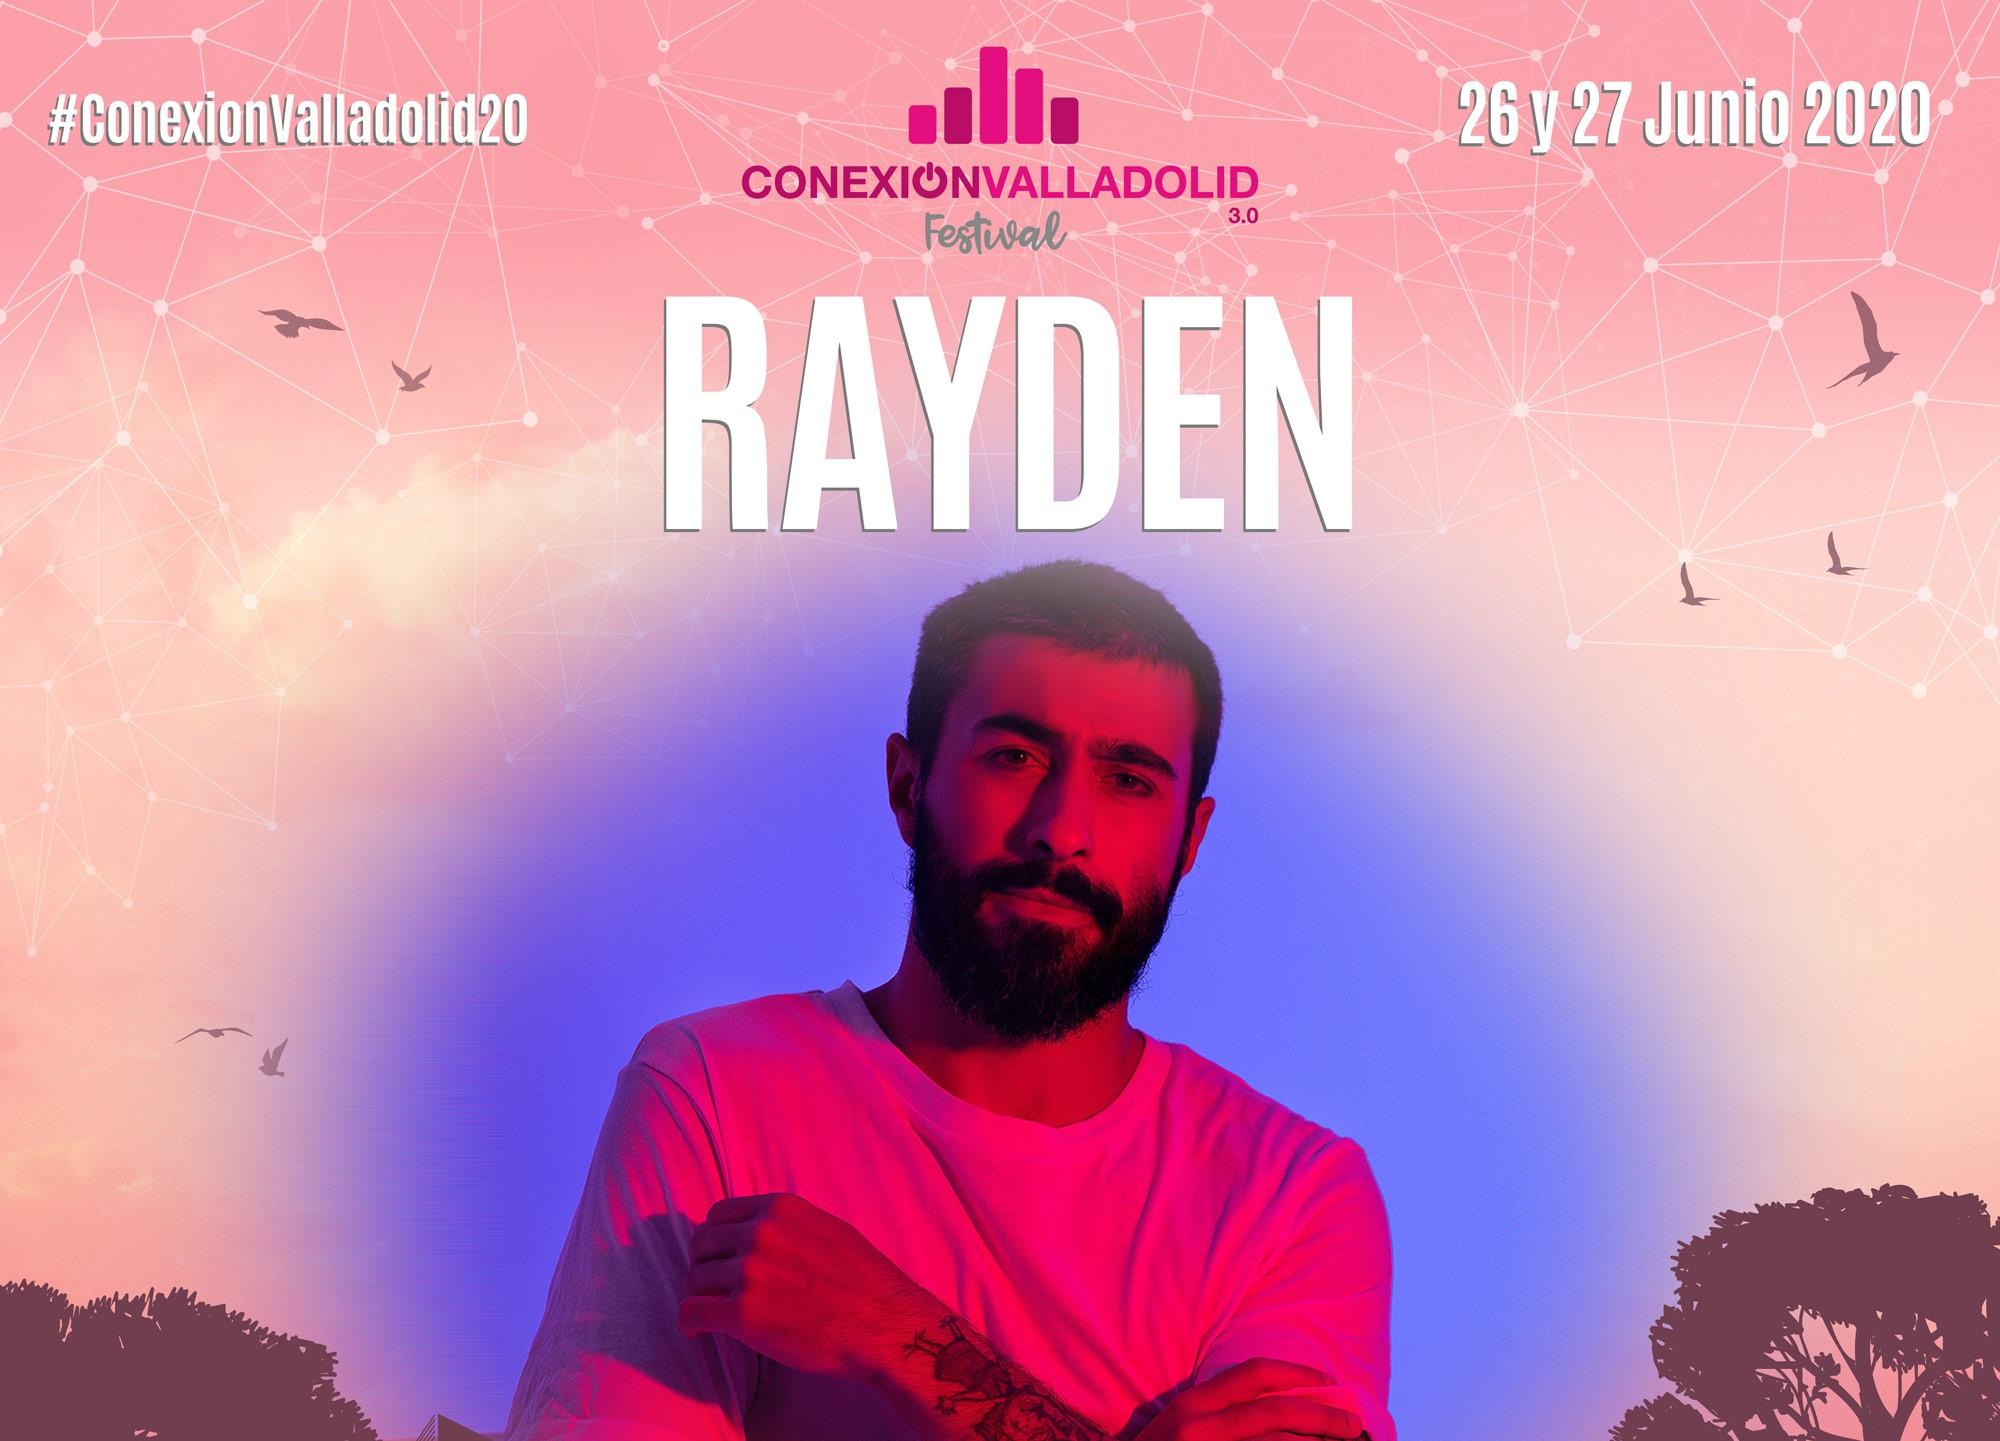 RAYDEN_ConexionVaFest20_v2_Web cortada